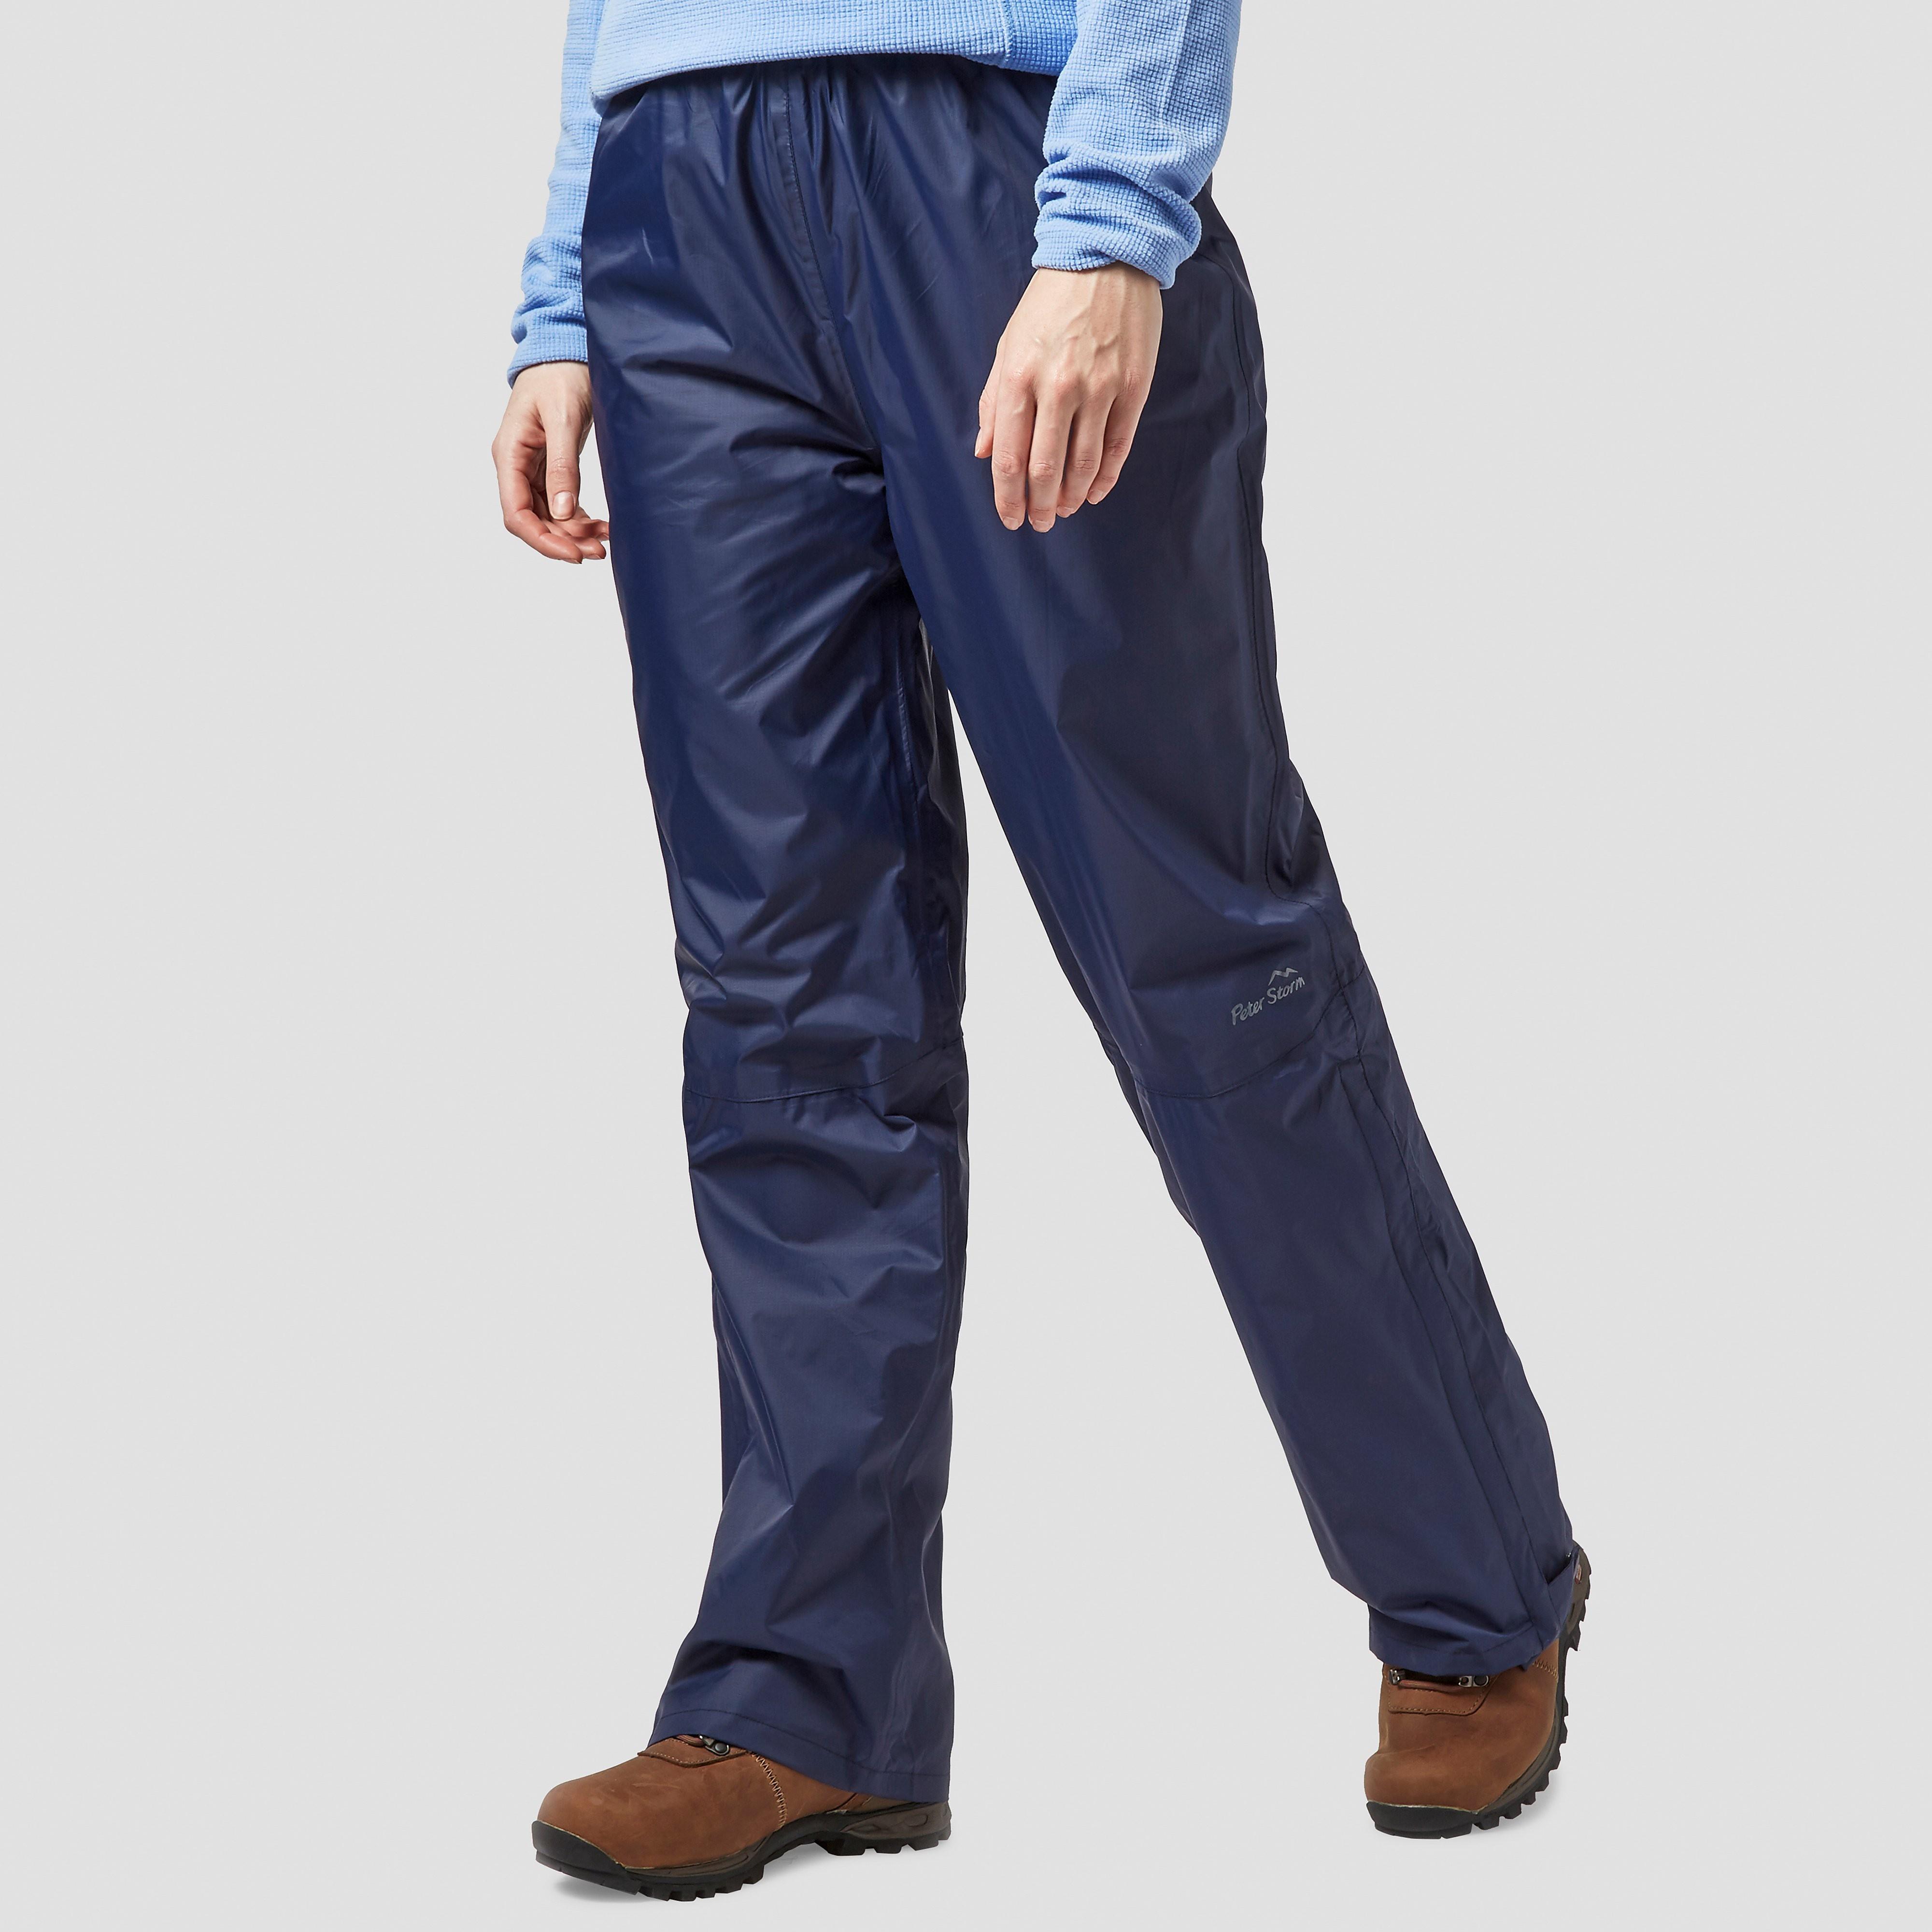 Peter Storm Women's Tempest Waterproof Trousers